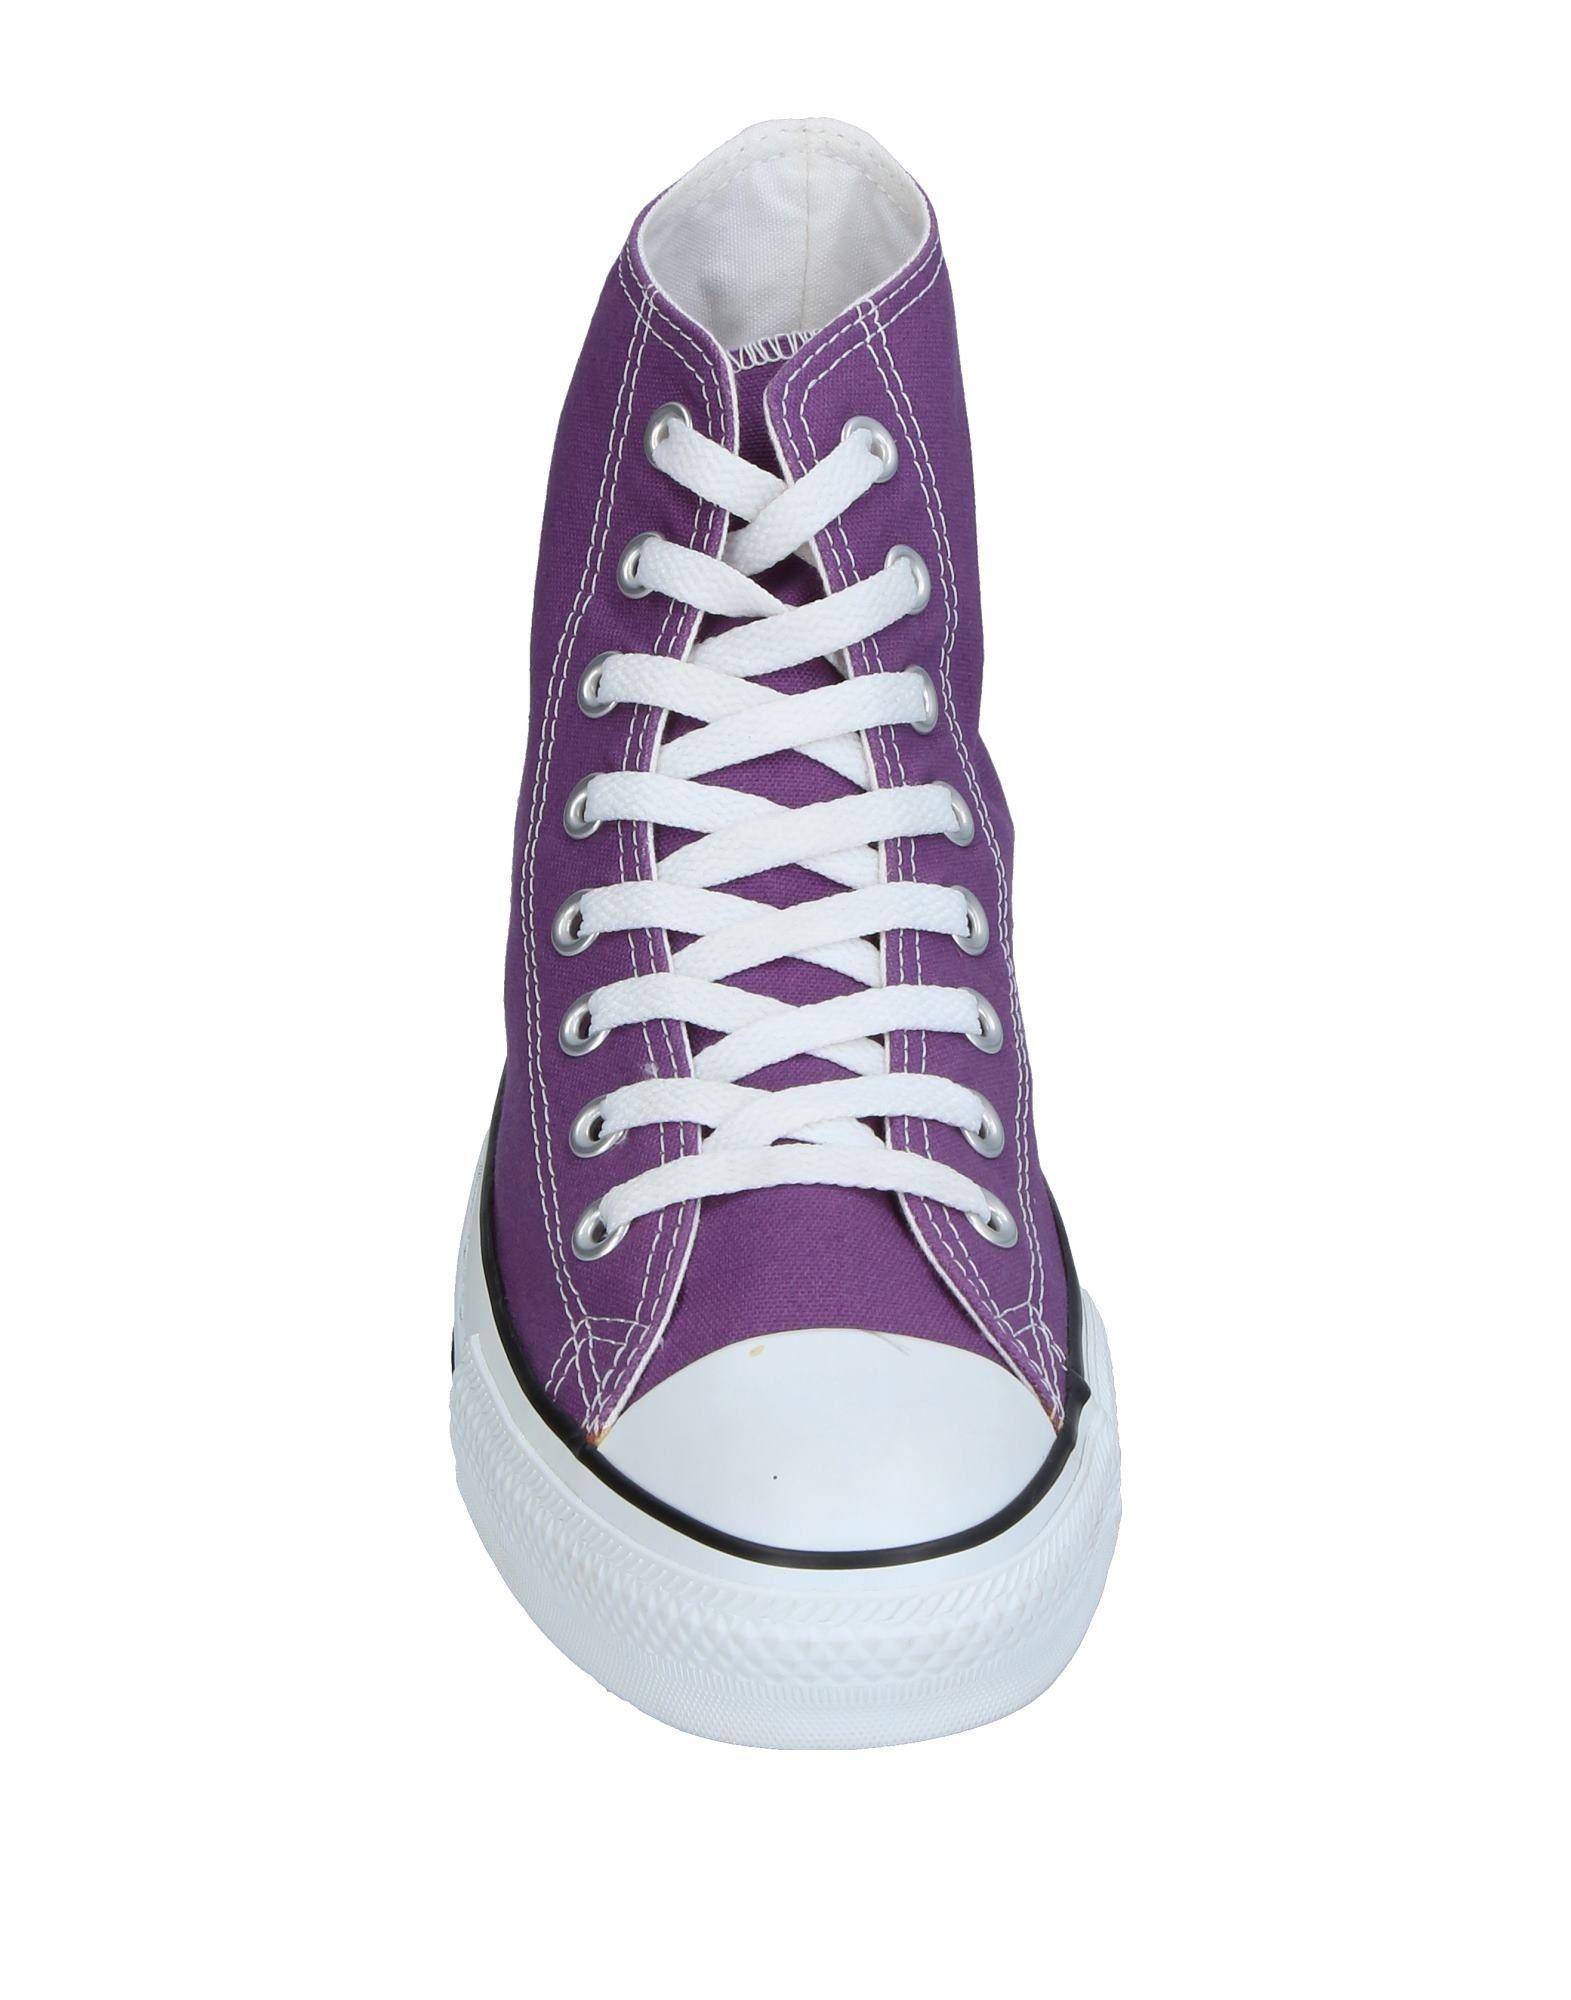 Converse Converse Converse All Star Sneakers Herren Gutes Preis-Leistungs-Verhältnis, es lohnt sich e9774e